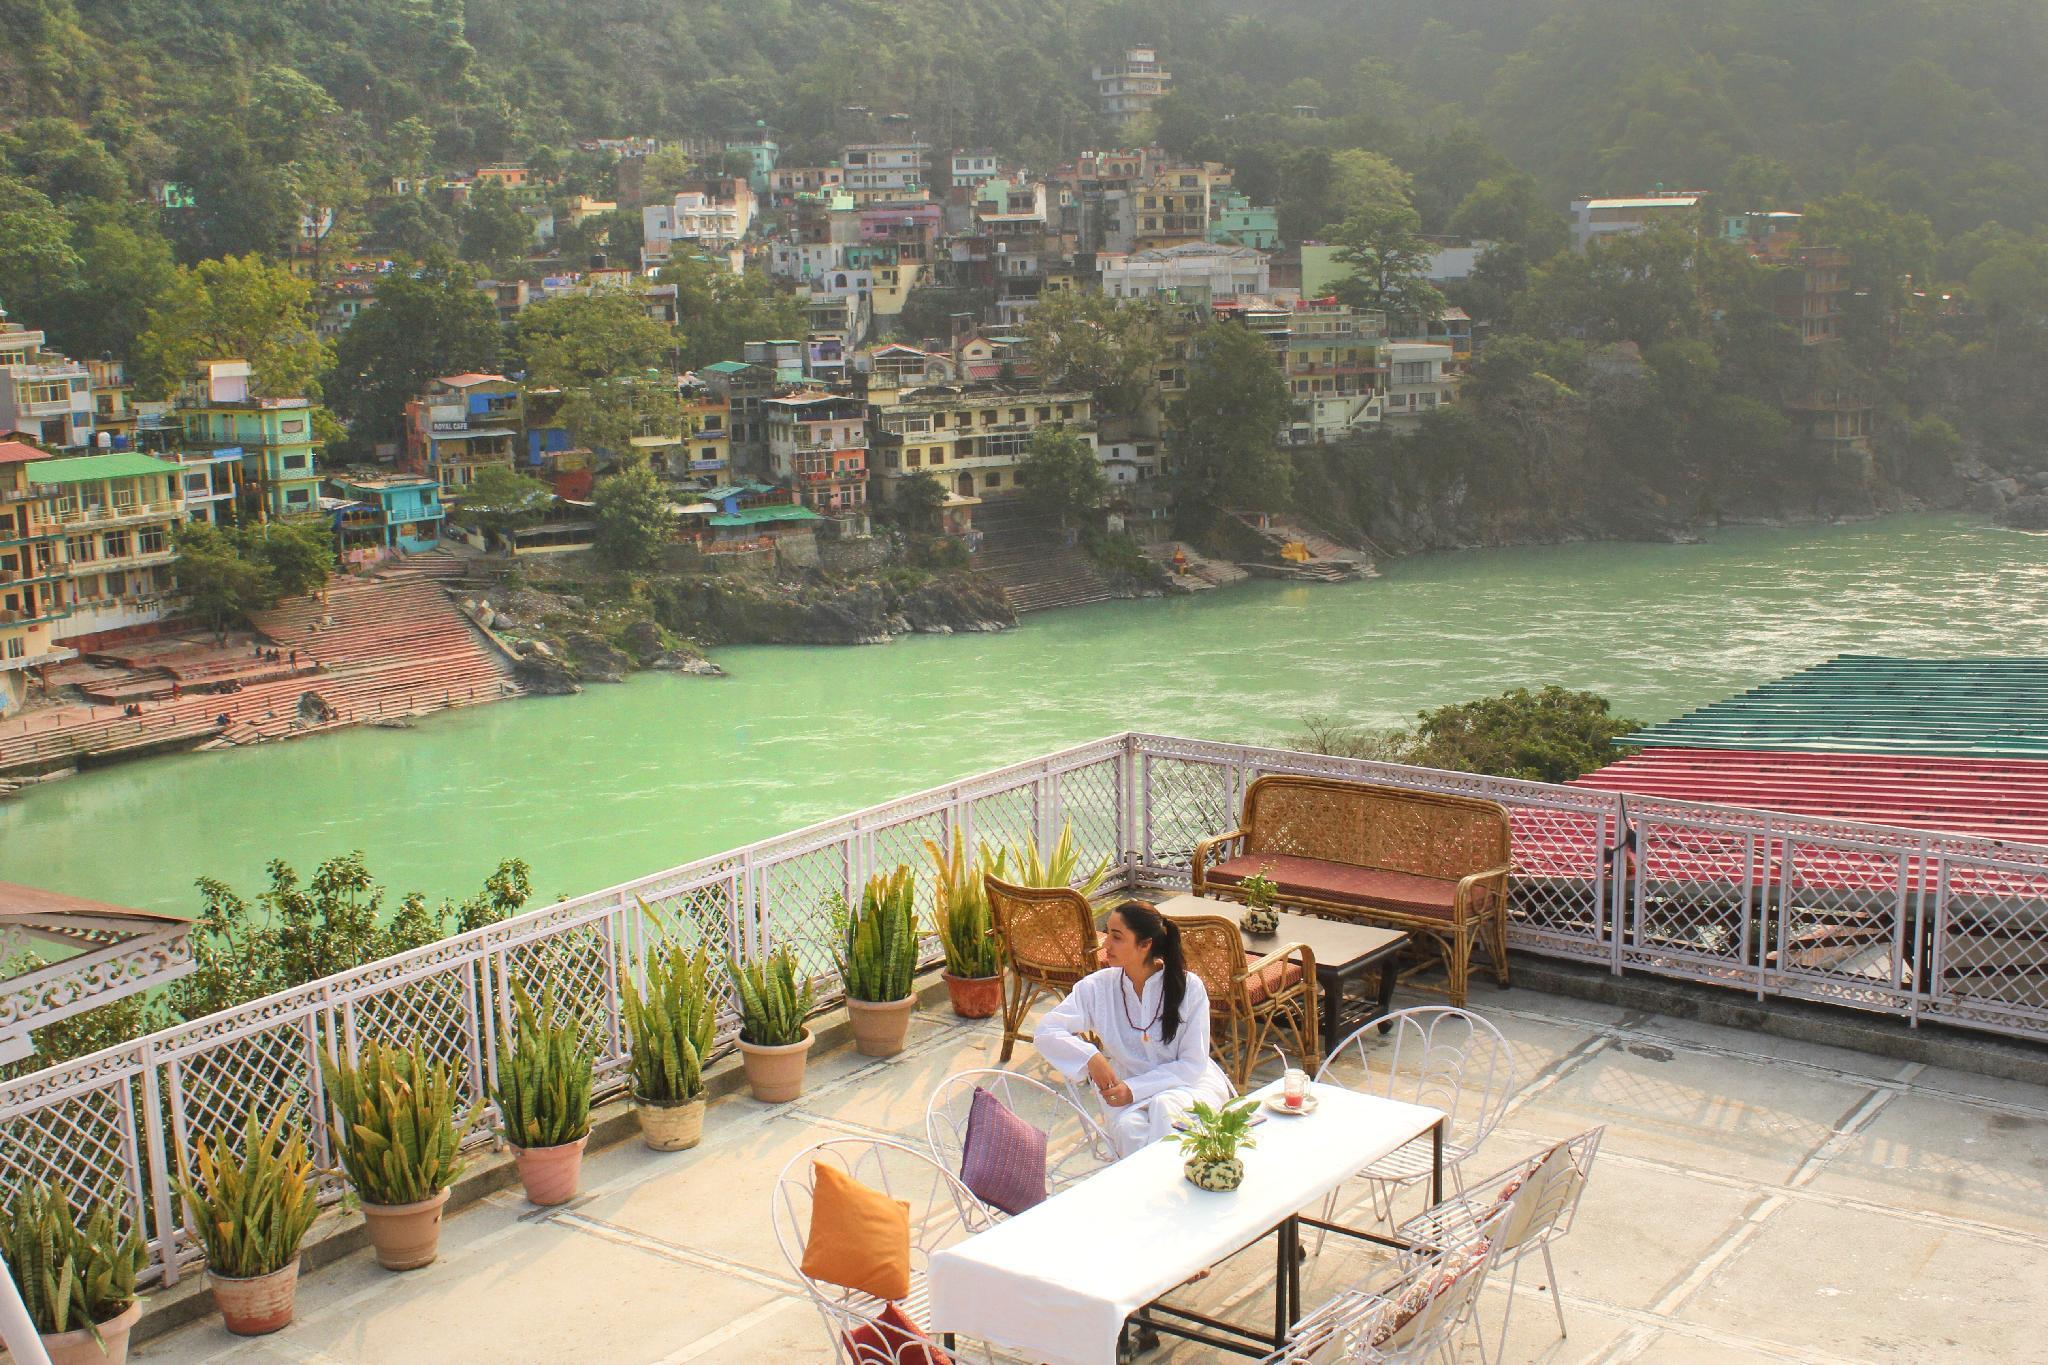 Hotel Ishan   A Riverside Retreat